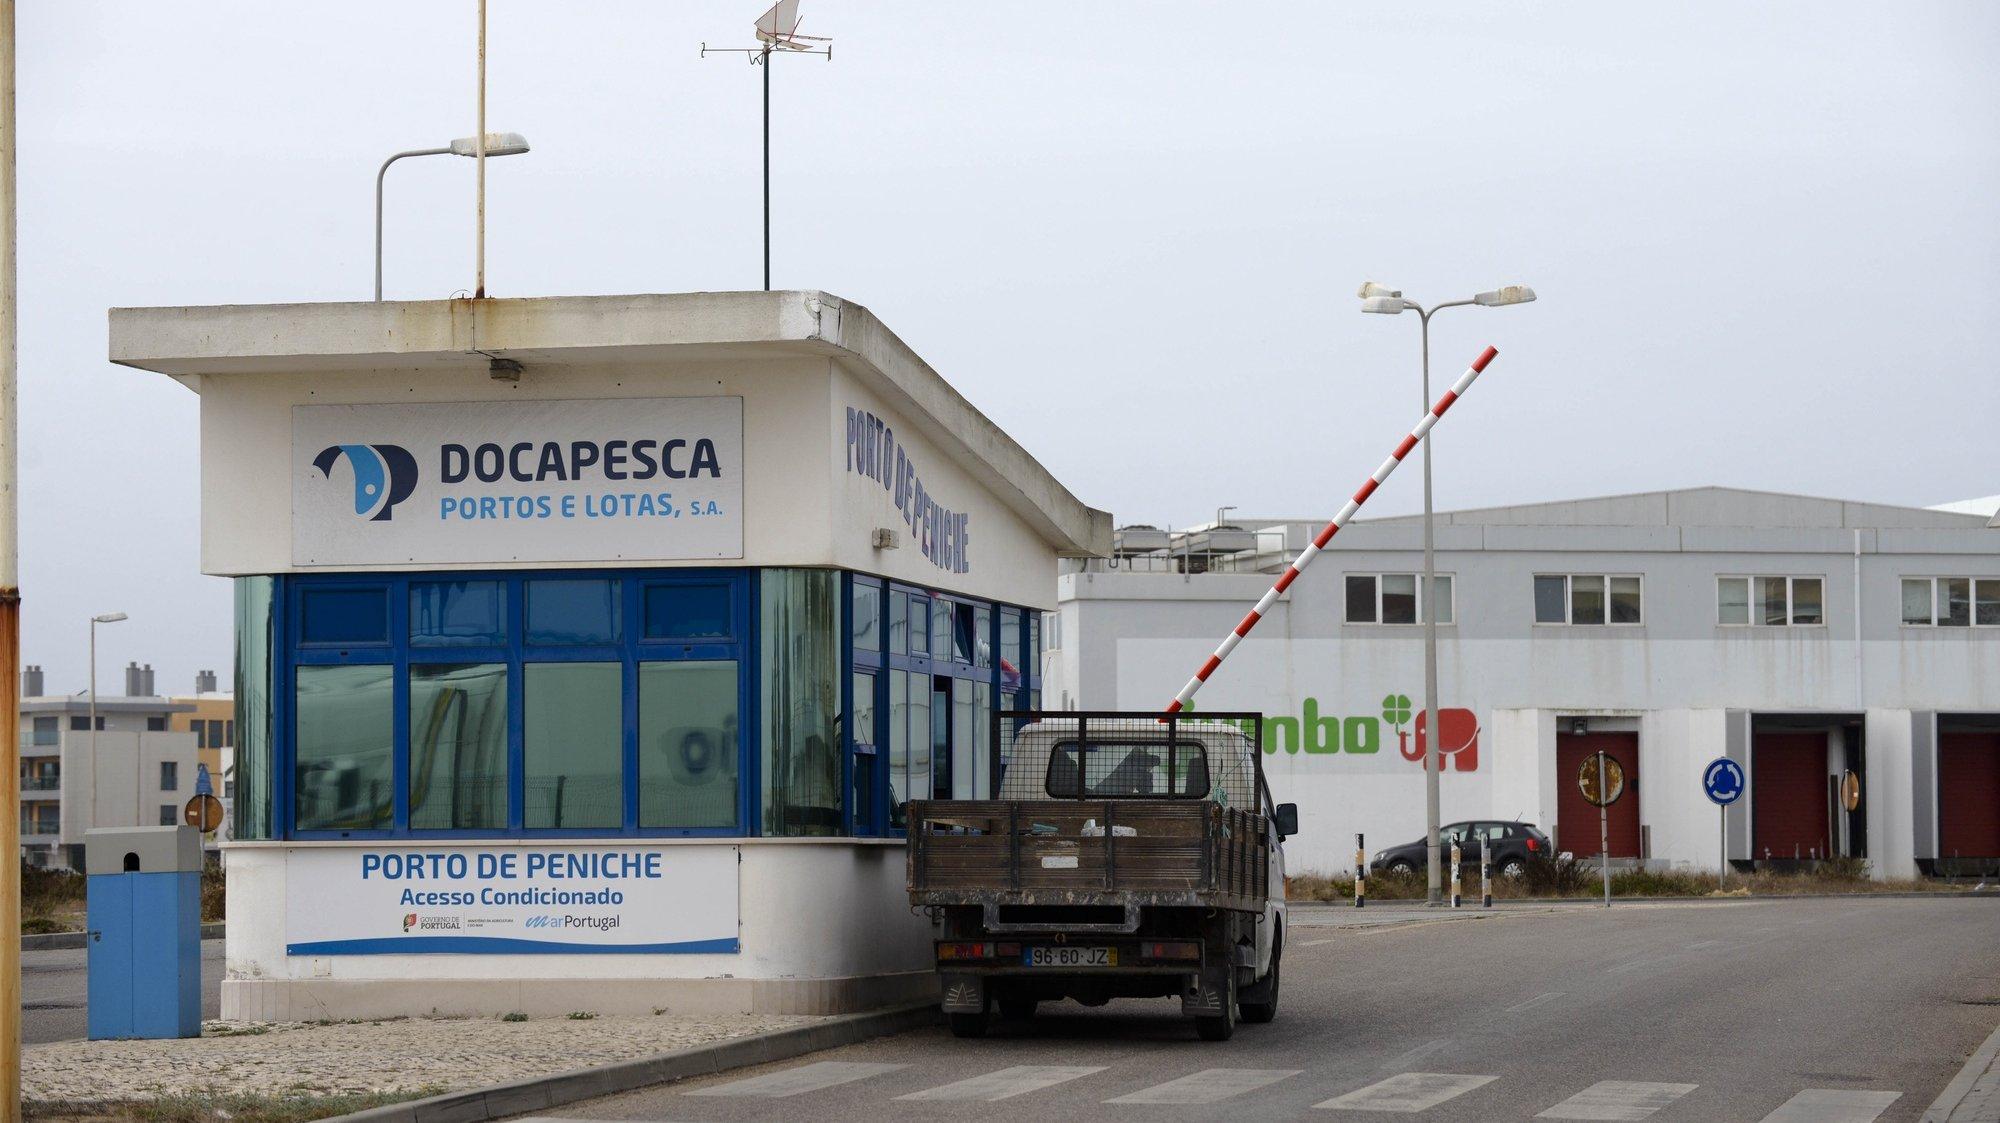 O porto e docapesca de Peniche, 19 de outubro de 2017. CARLOS BARROSO/LUSA